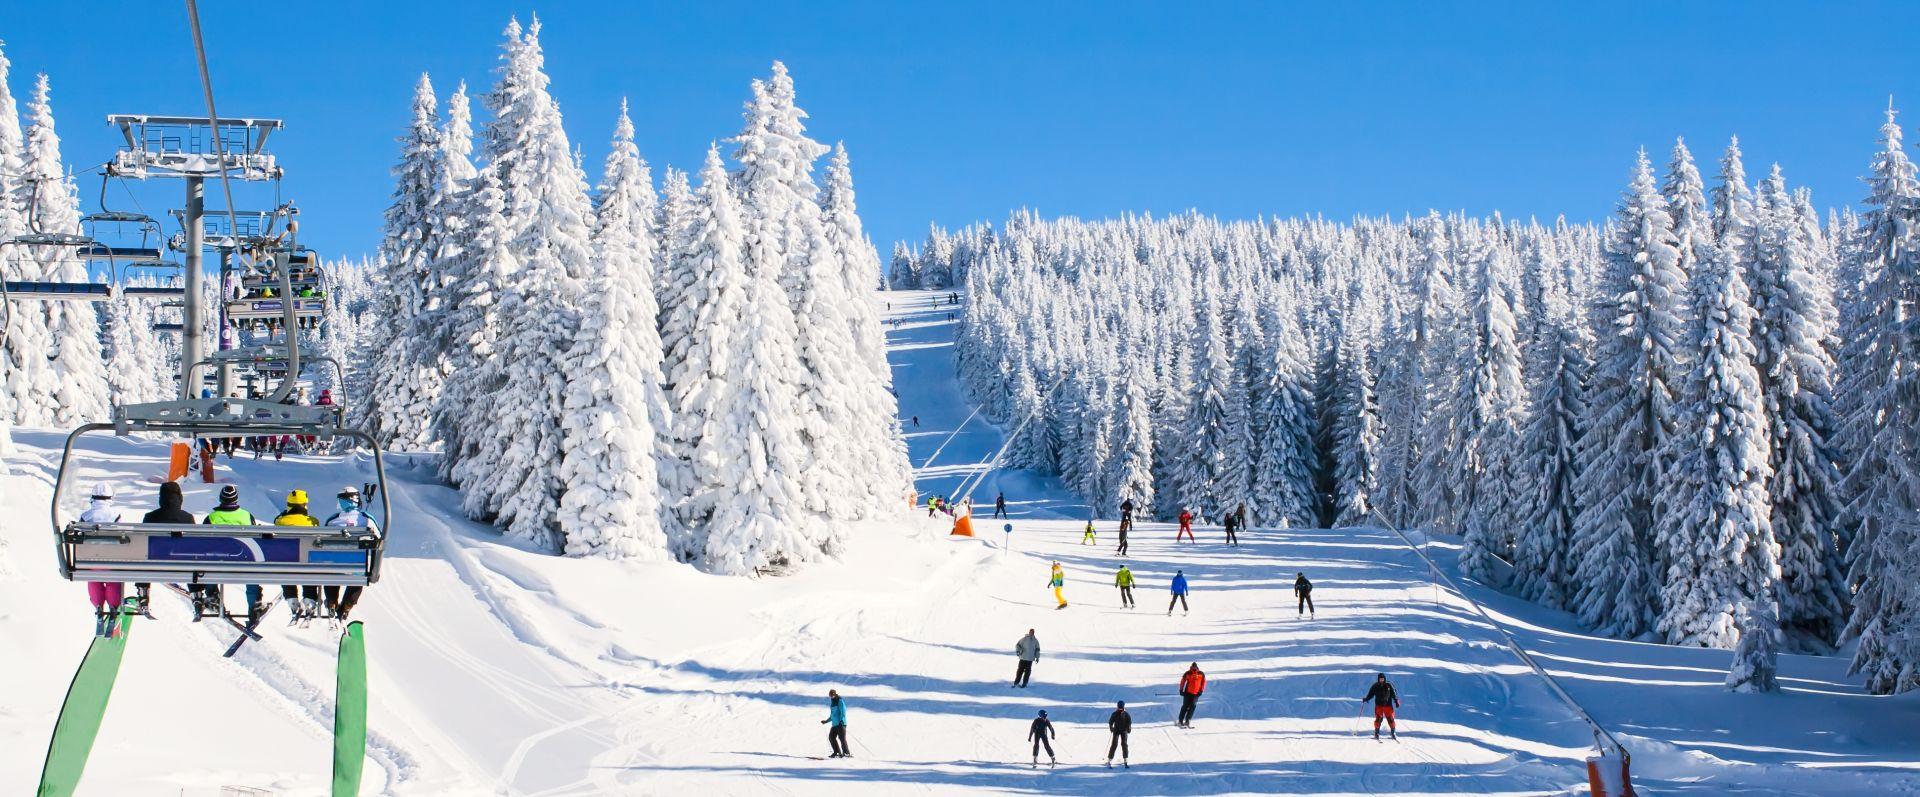 Welcome to Big Sky Resort 59716 Montana